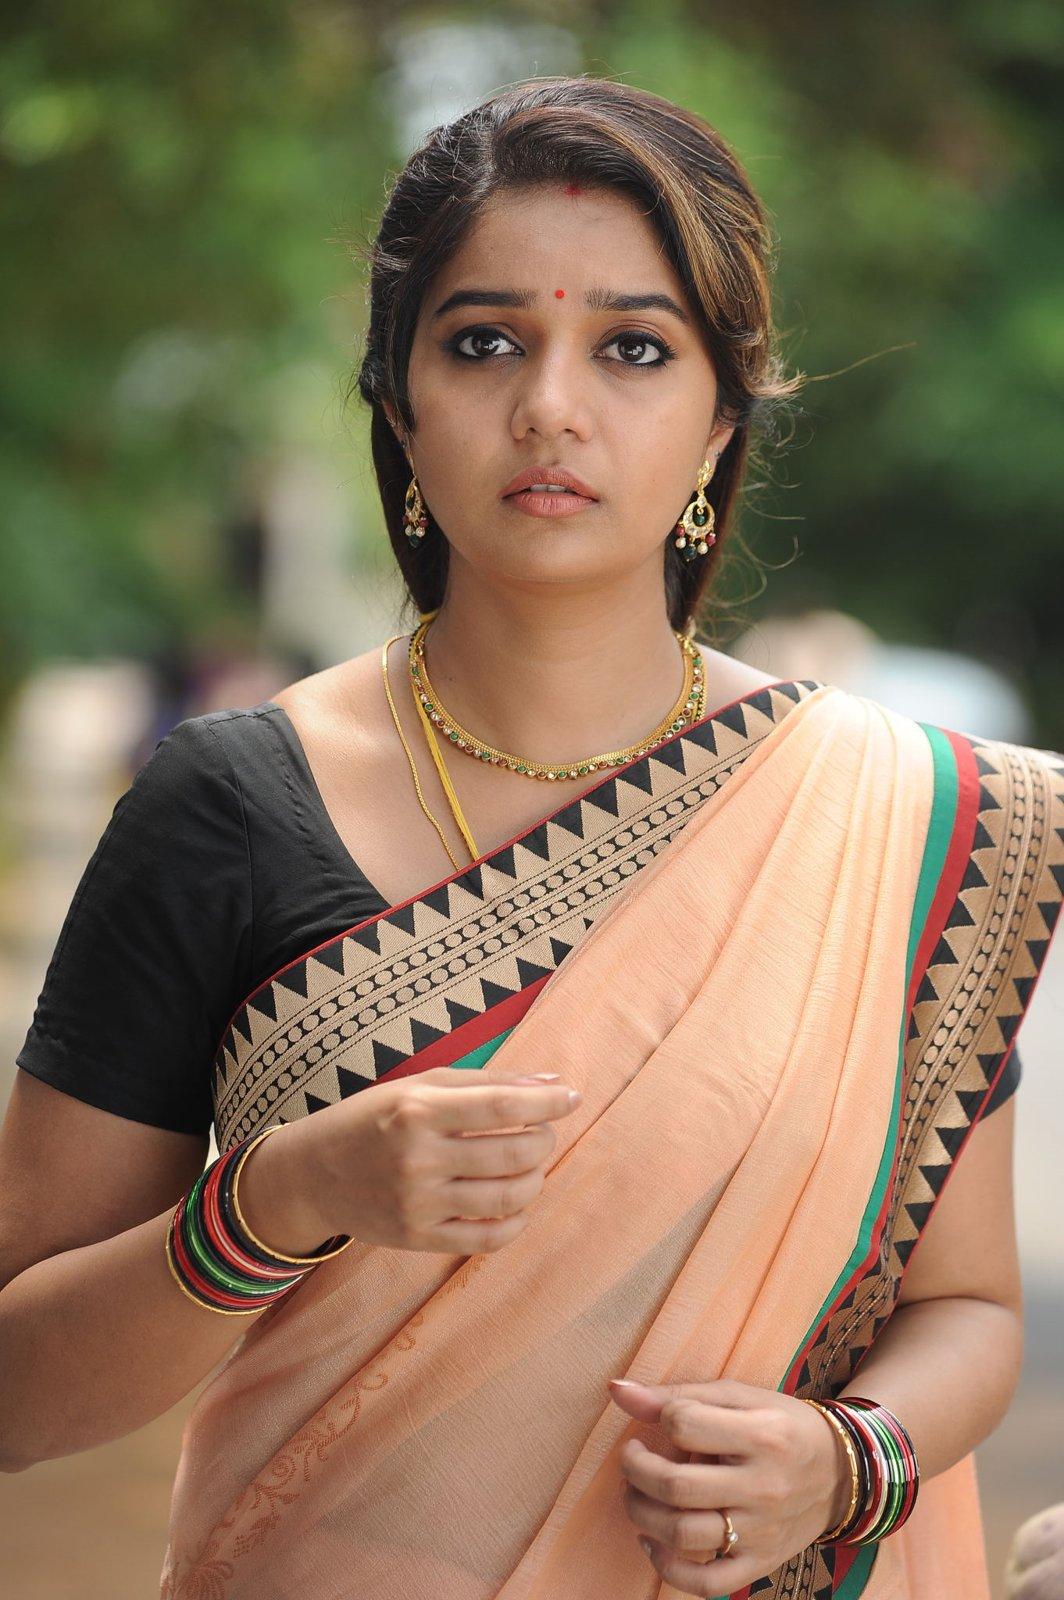 Colors Swathi Tripura Tripura Movie hd Stills Swathi